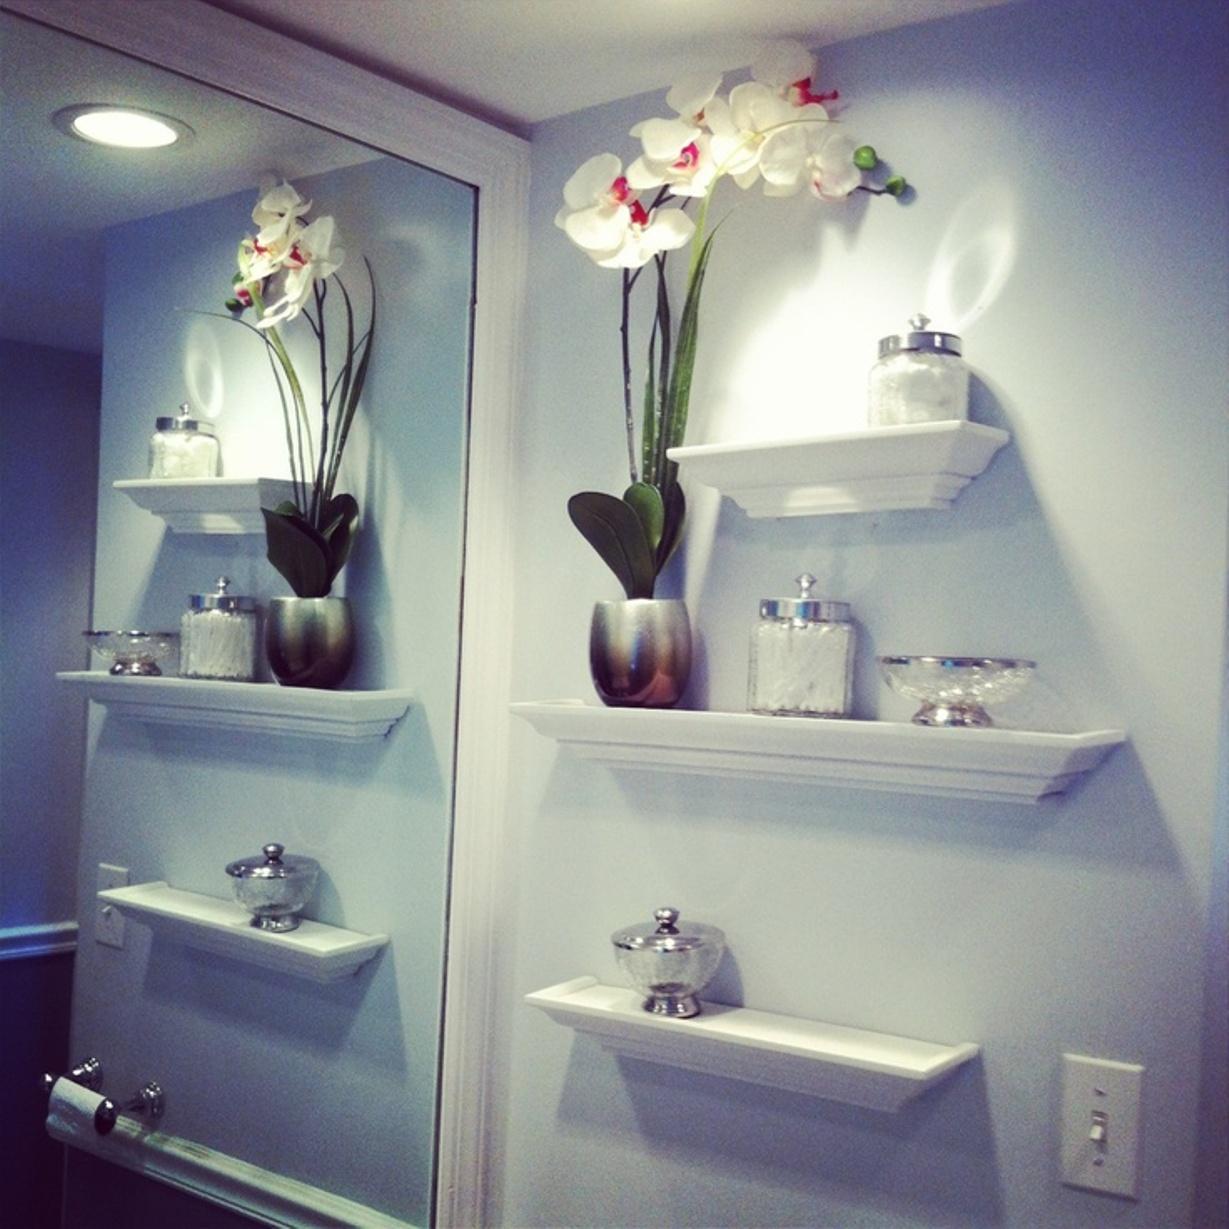 Bathroom Wall Decorations Of Awesome Canvas Art Diy Art Acnn Decor